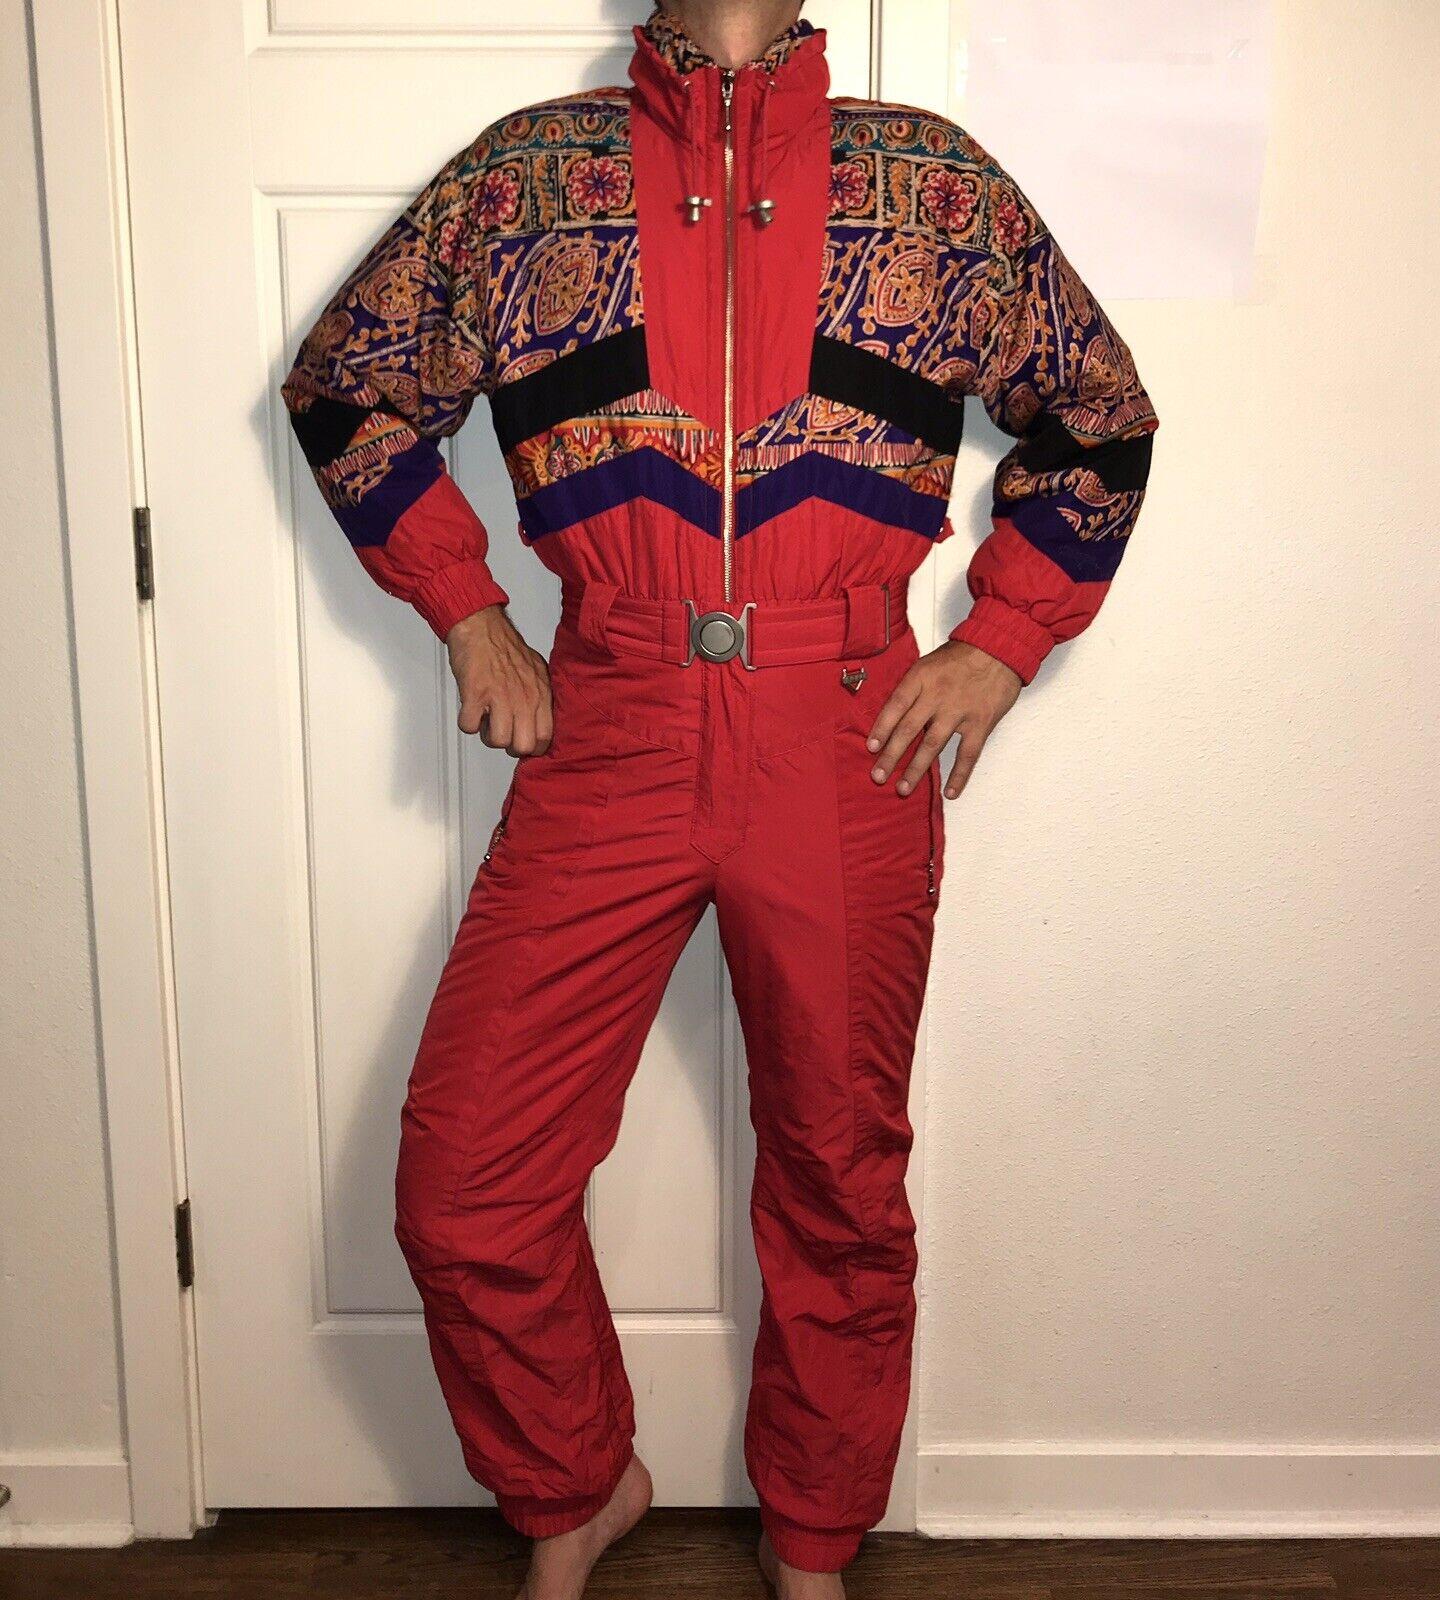 Vtg 80s 90s rot FERA One Piece SKI SUIT Snow Bib onsie RETRO Snowsuit damen 10